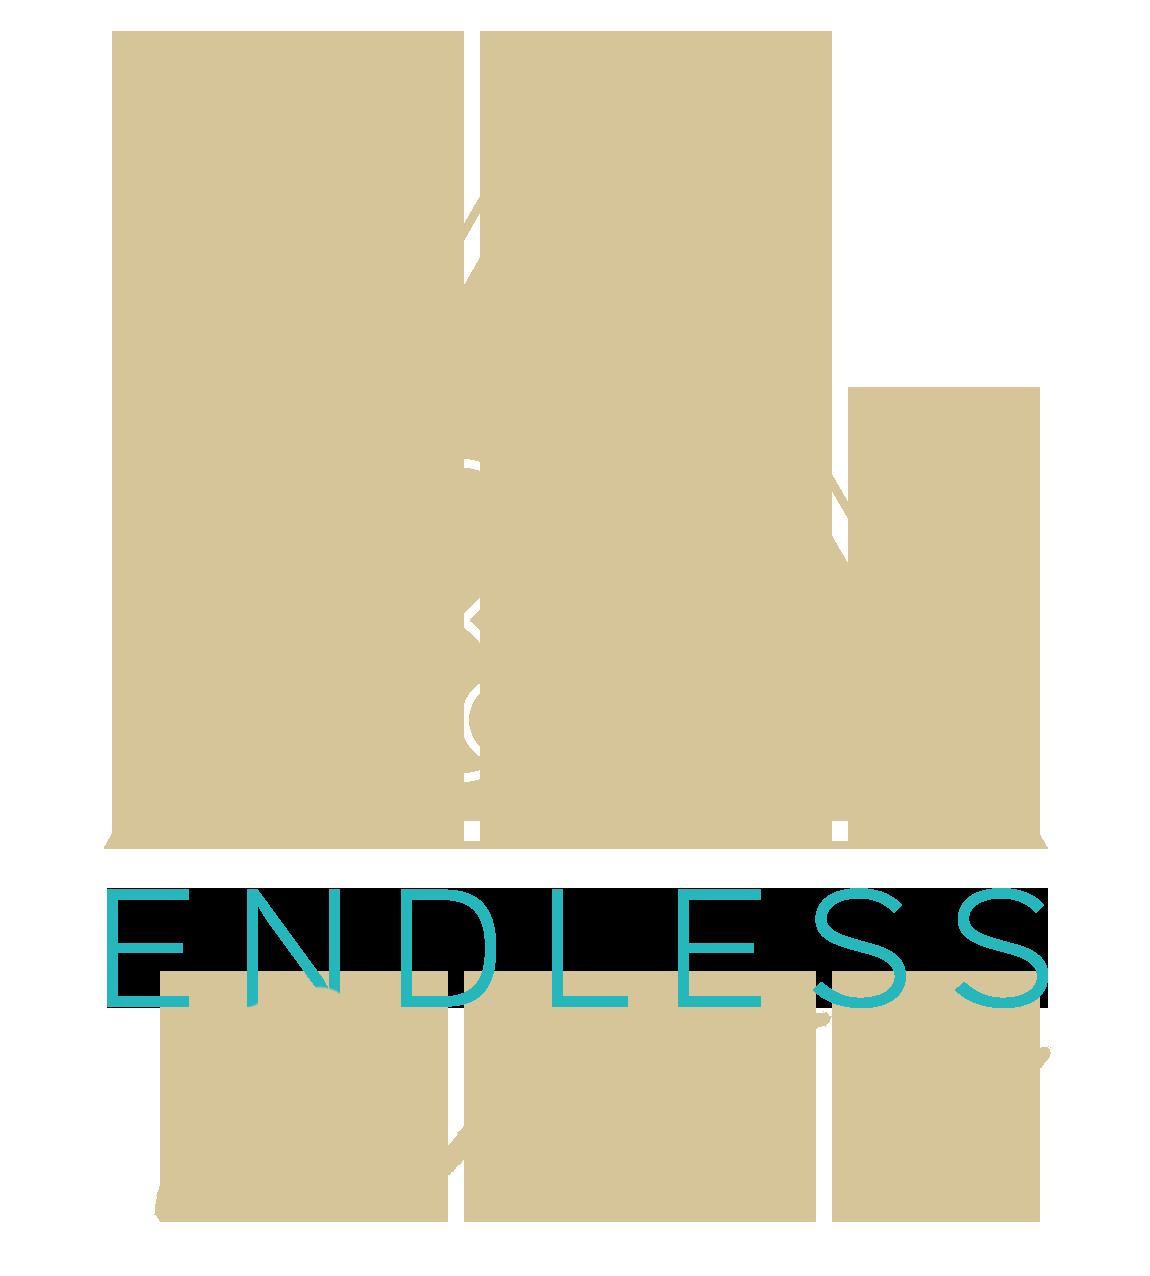 Endless Riviera